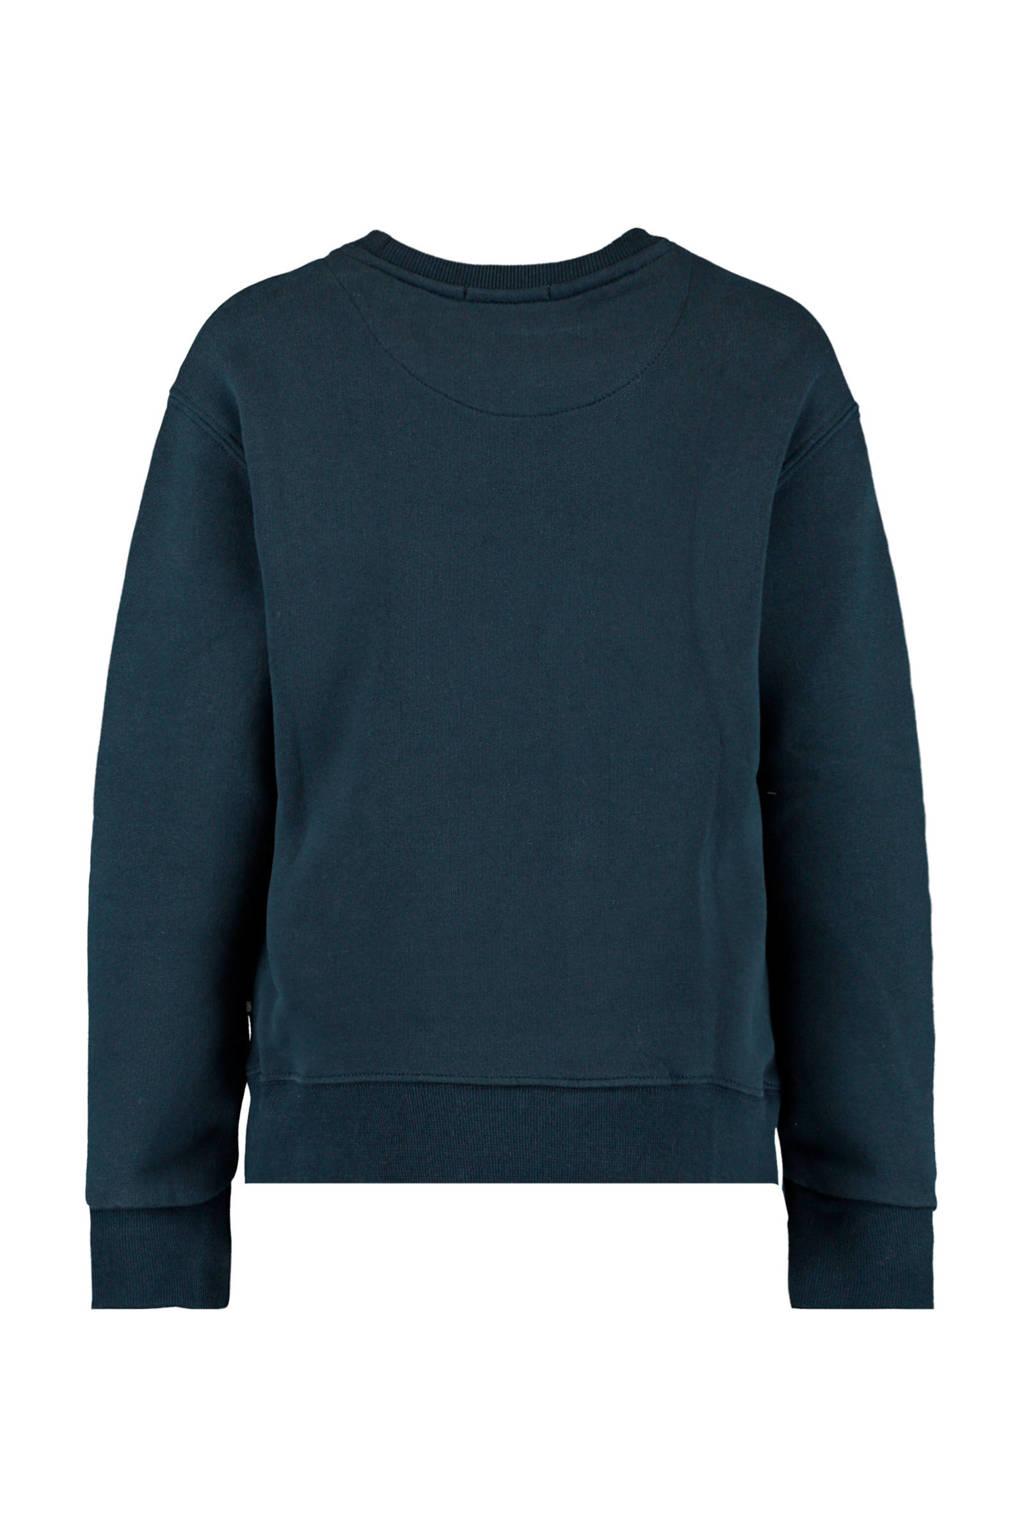 America Today Junior sweater Summer met tekst donkerblauw, Donkerblauw